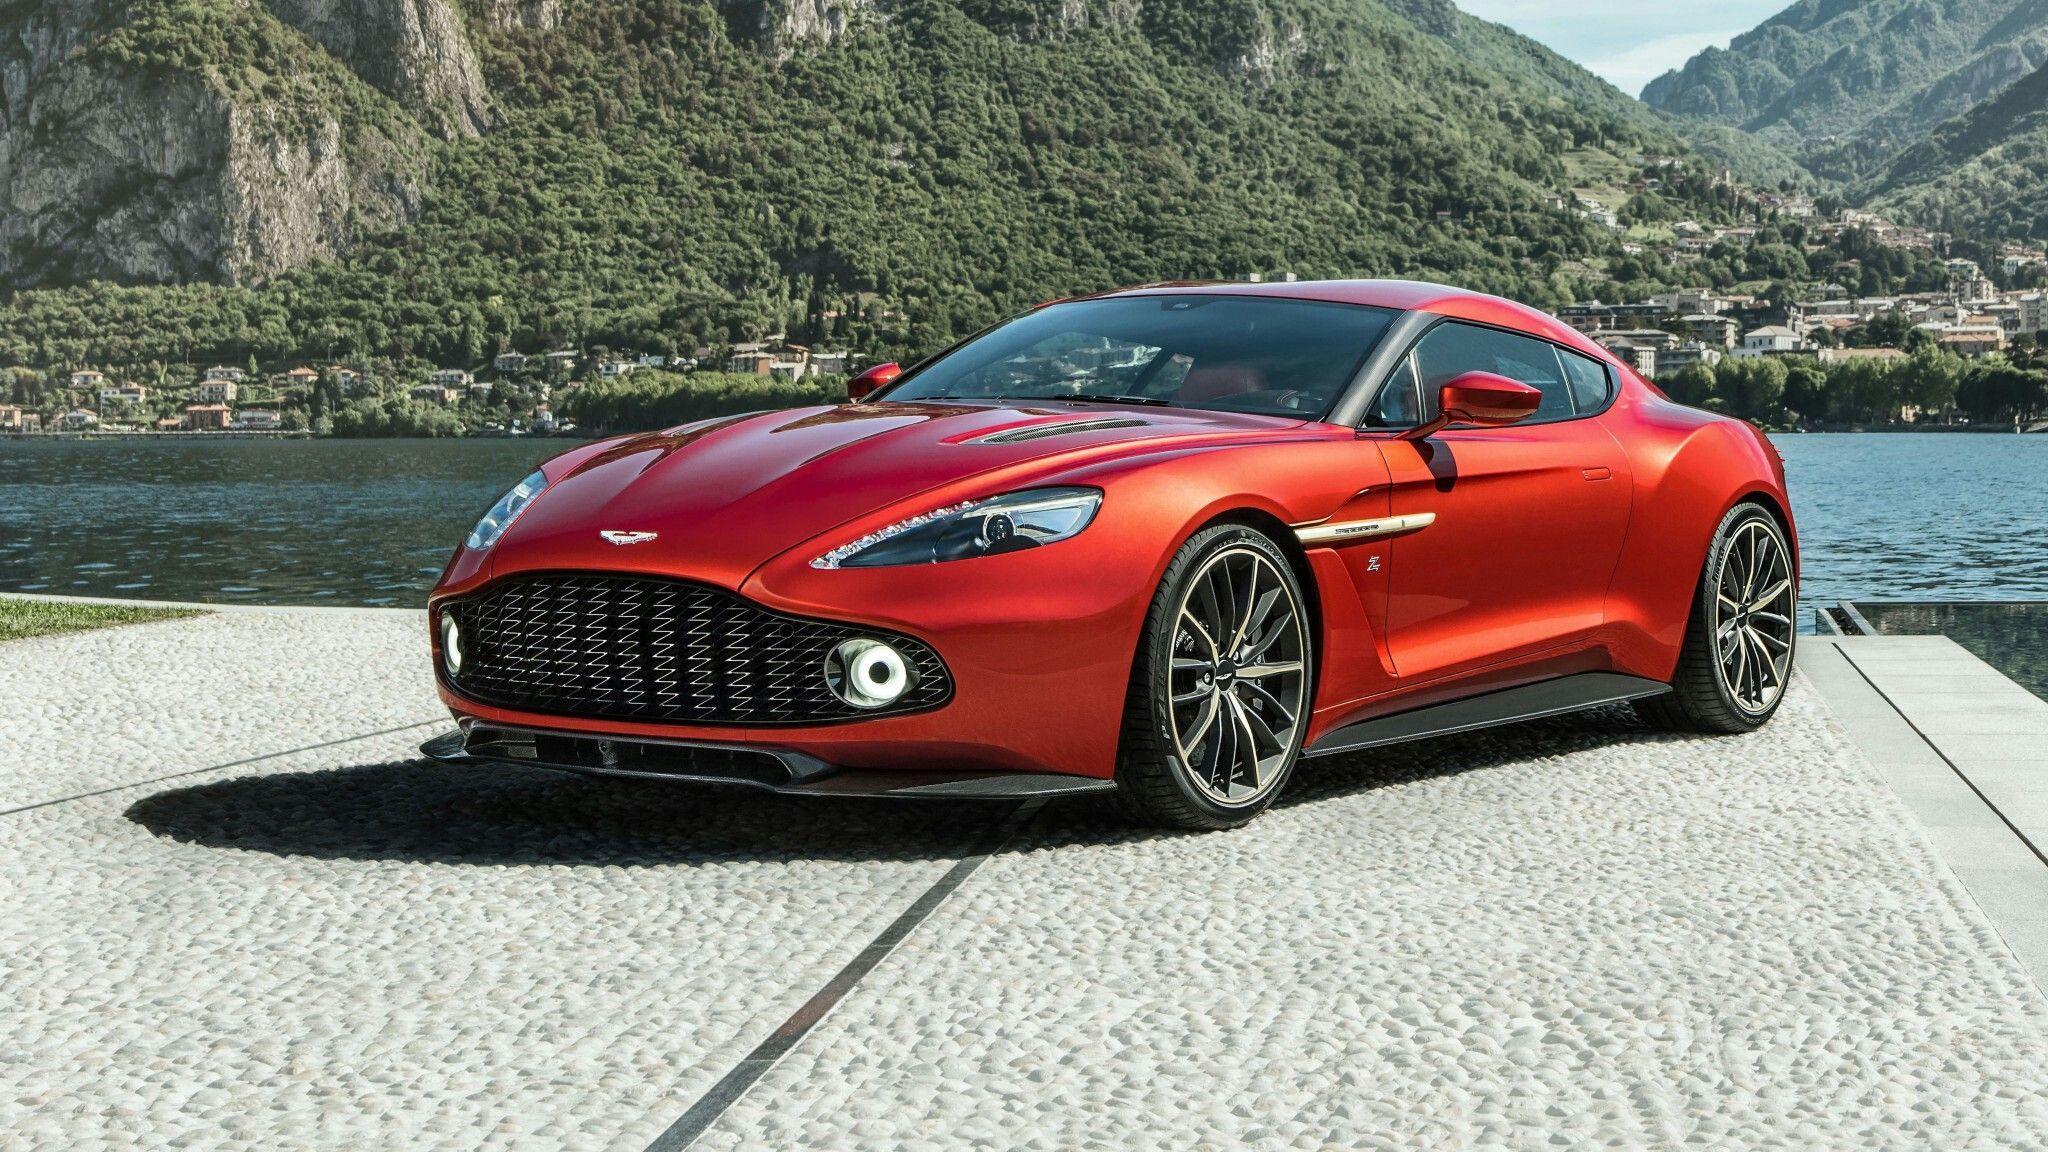 2017 Aston Martin Vanquish Zagato Hd Wallpaper Ihd Wallpapers